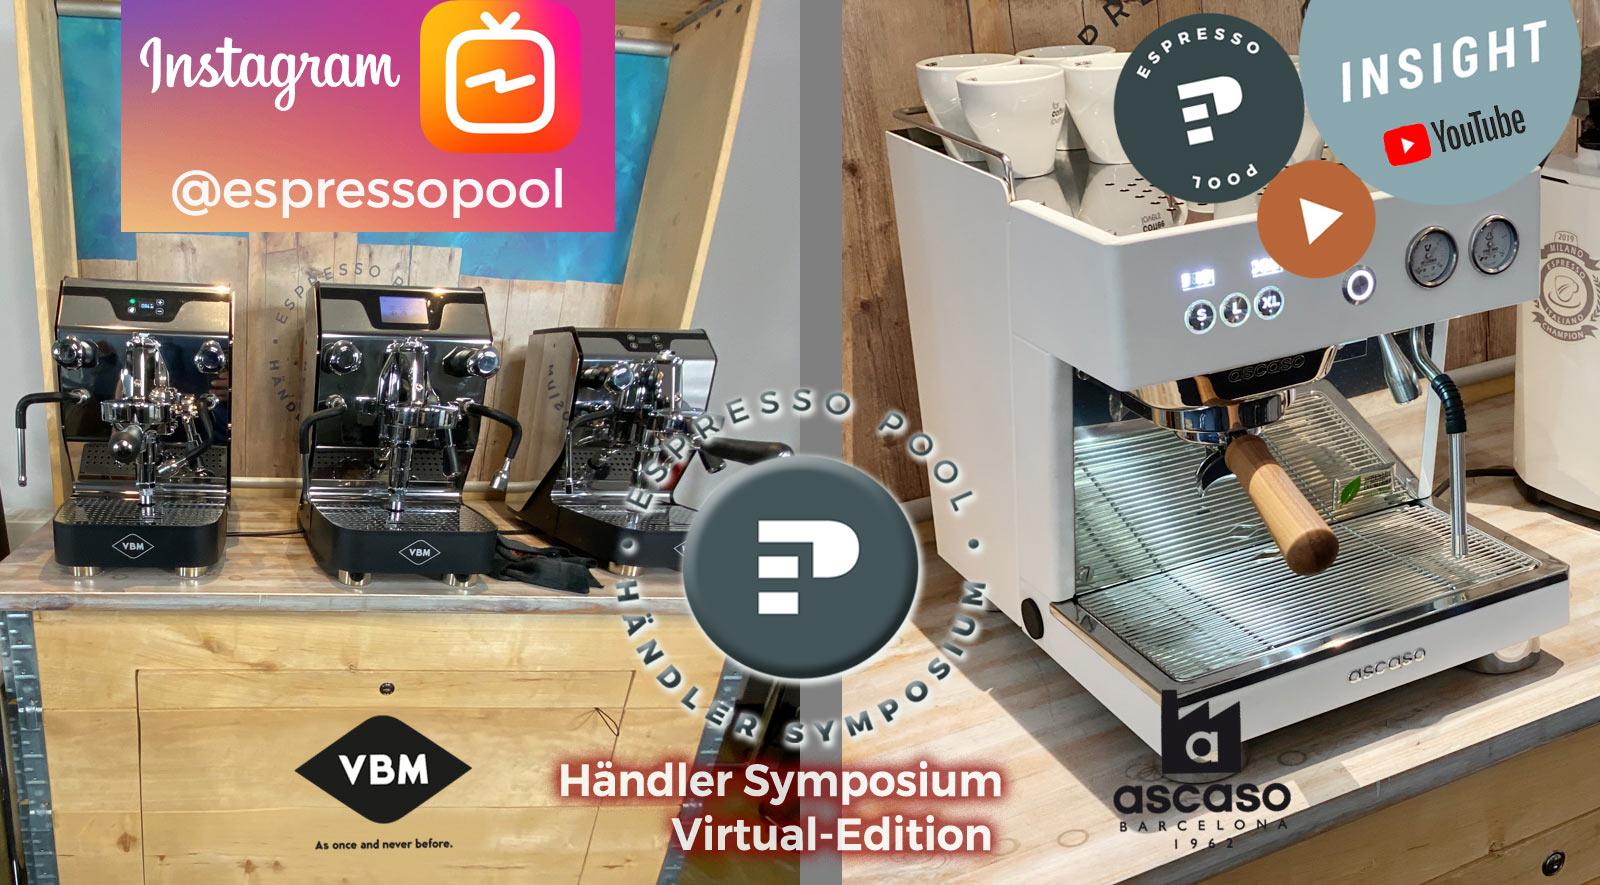 Händler Symposium Virtual Edition Nachschlag